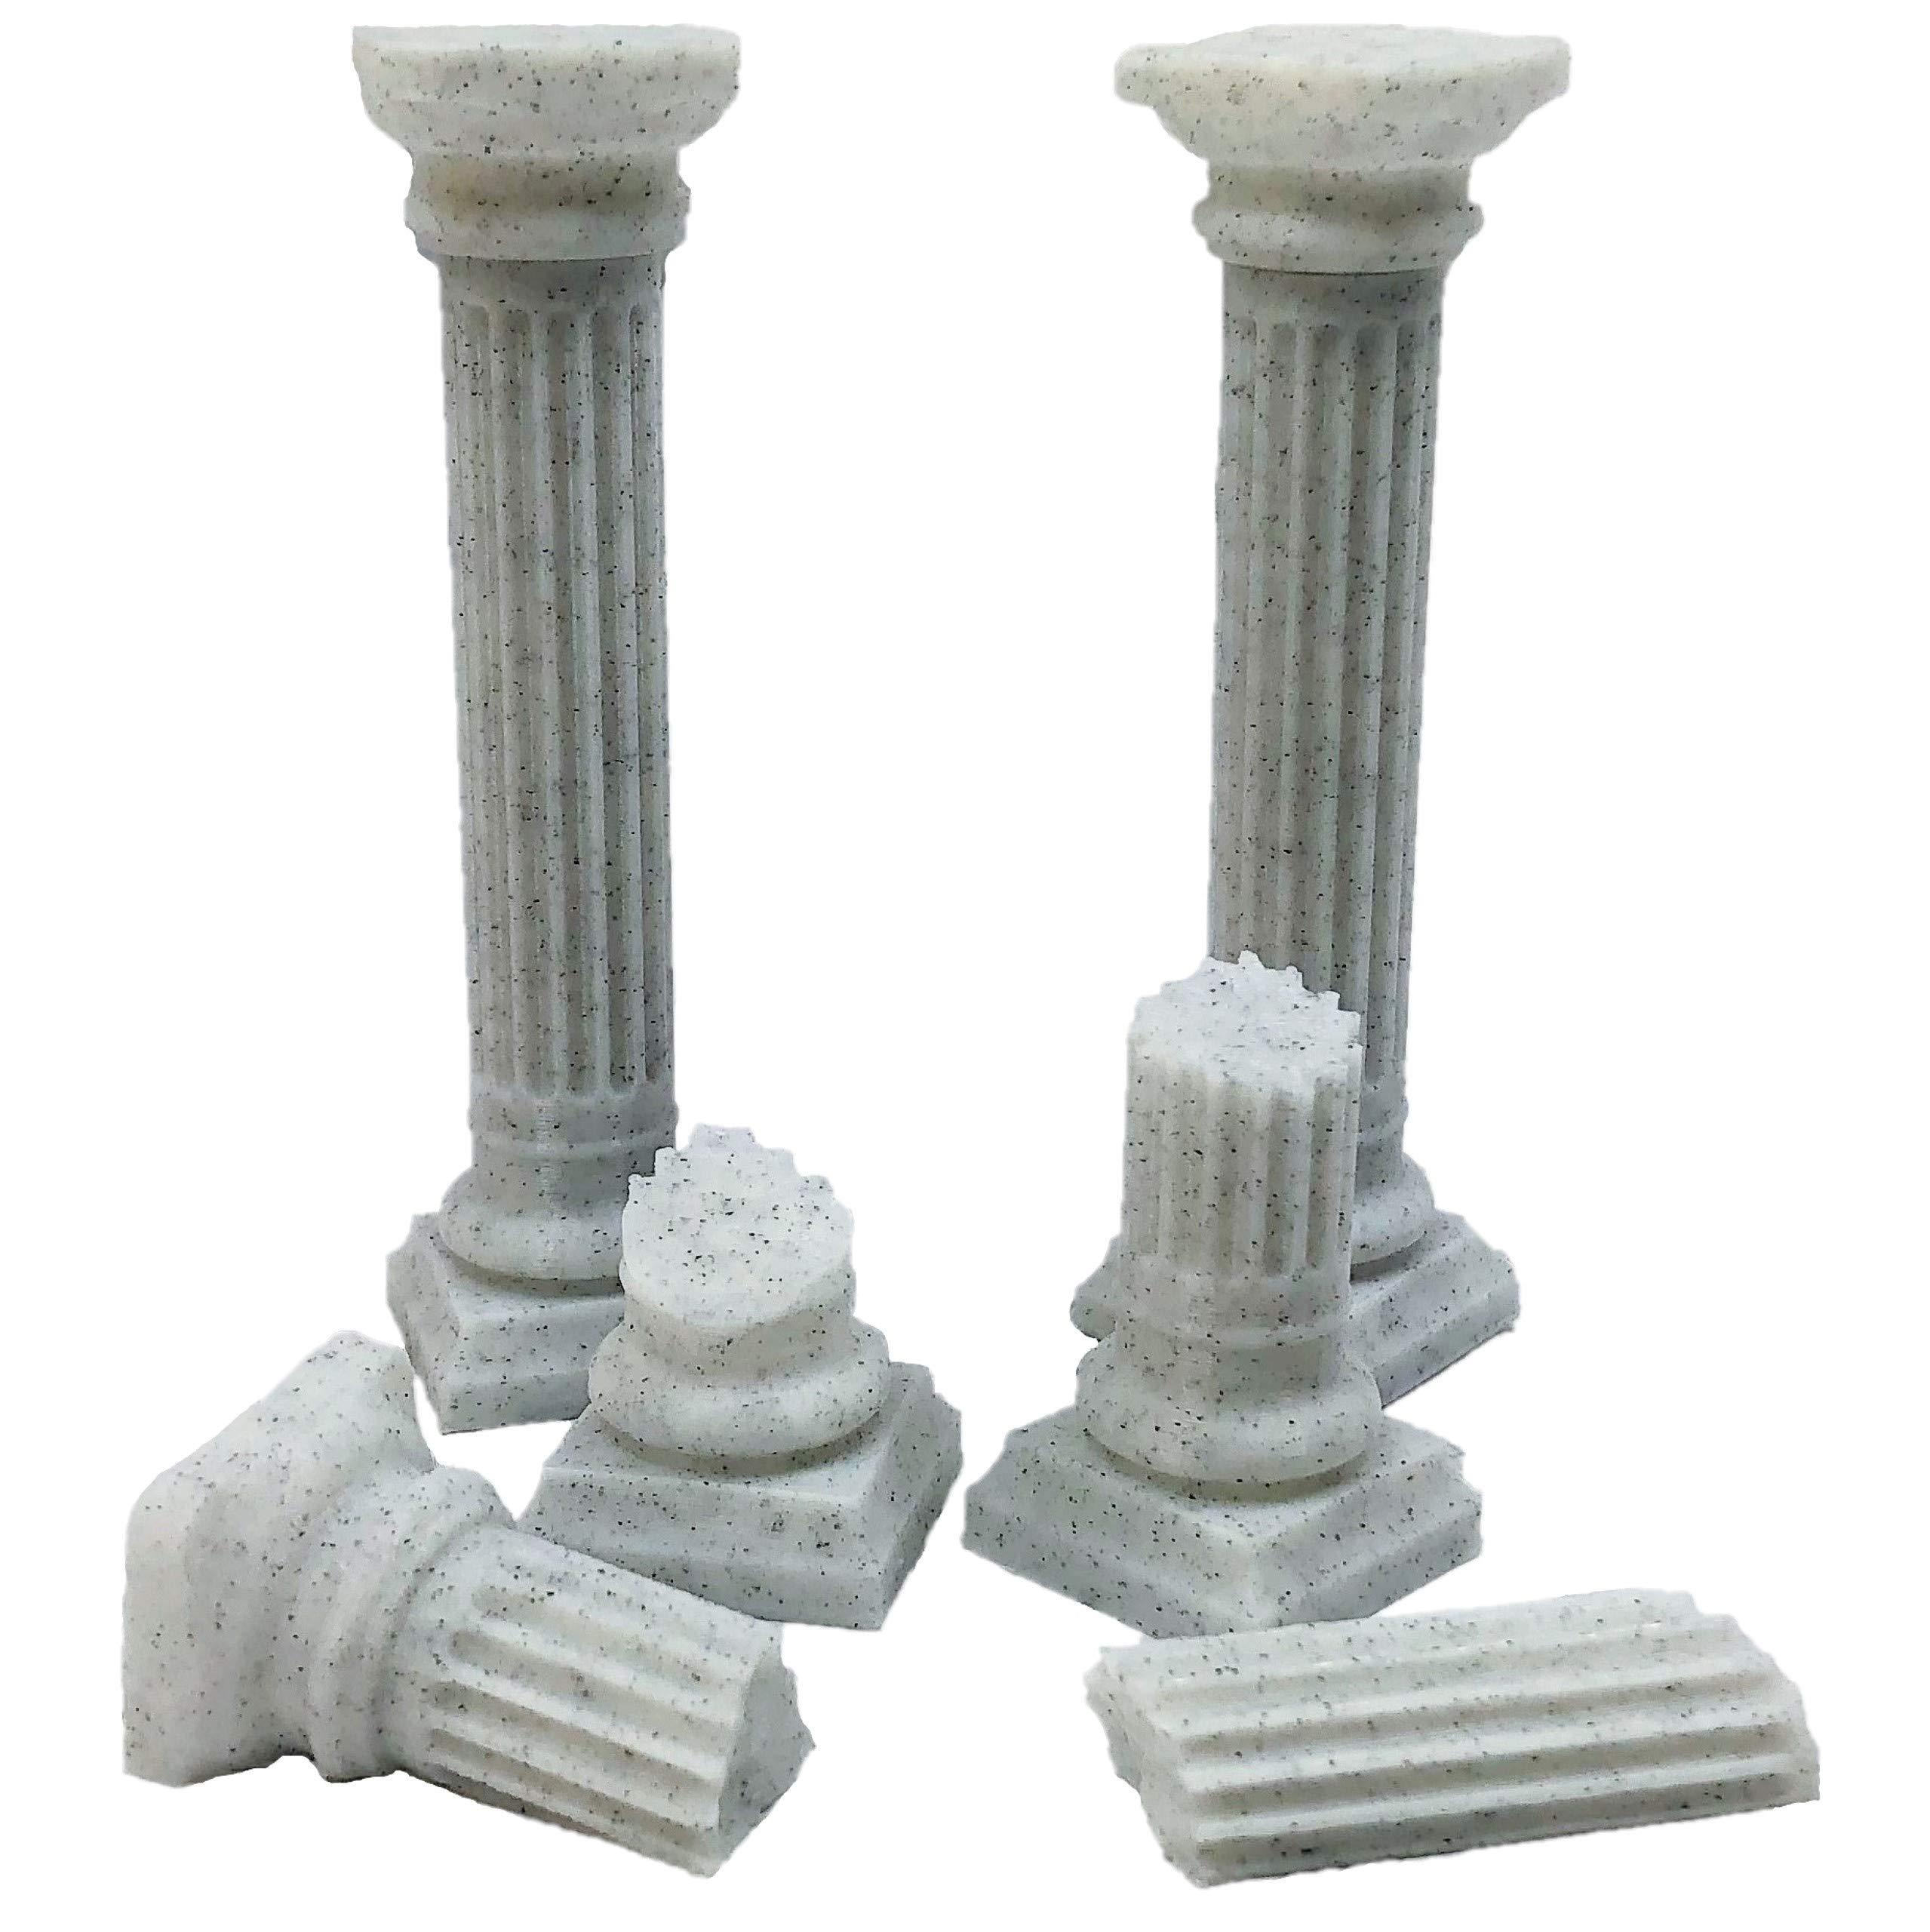 Roman Pillar Set - 28mm Gaming Terrain by Extruded Gaming